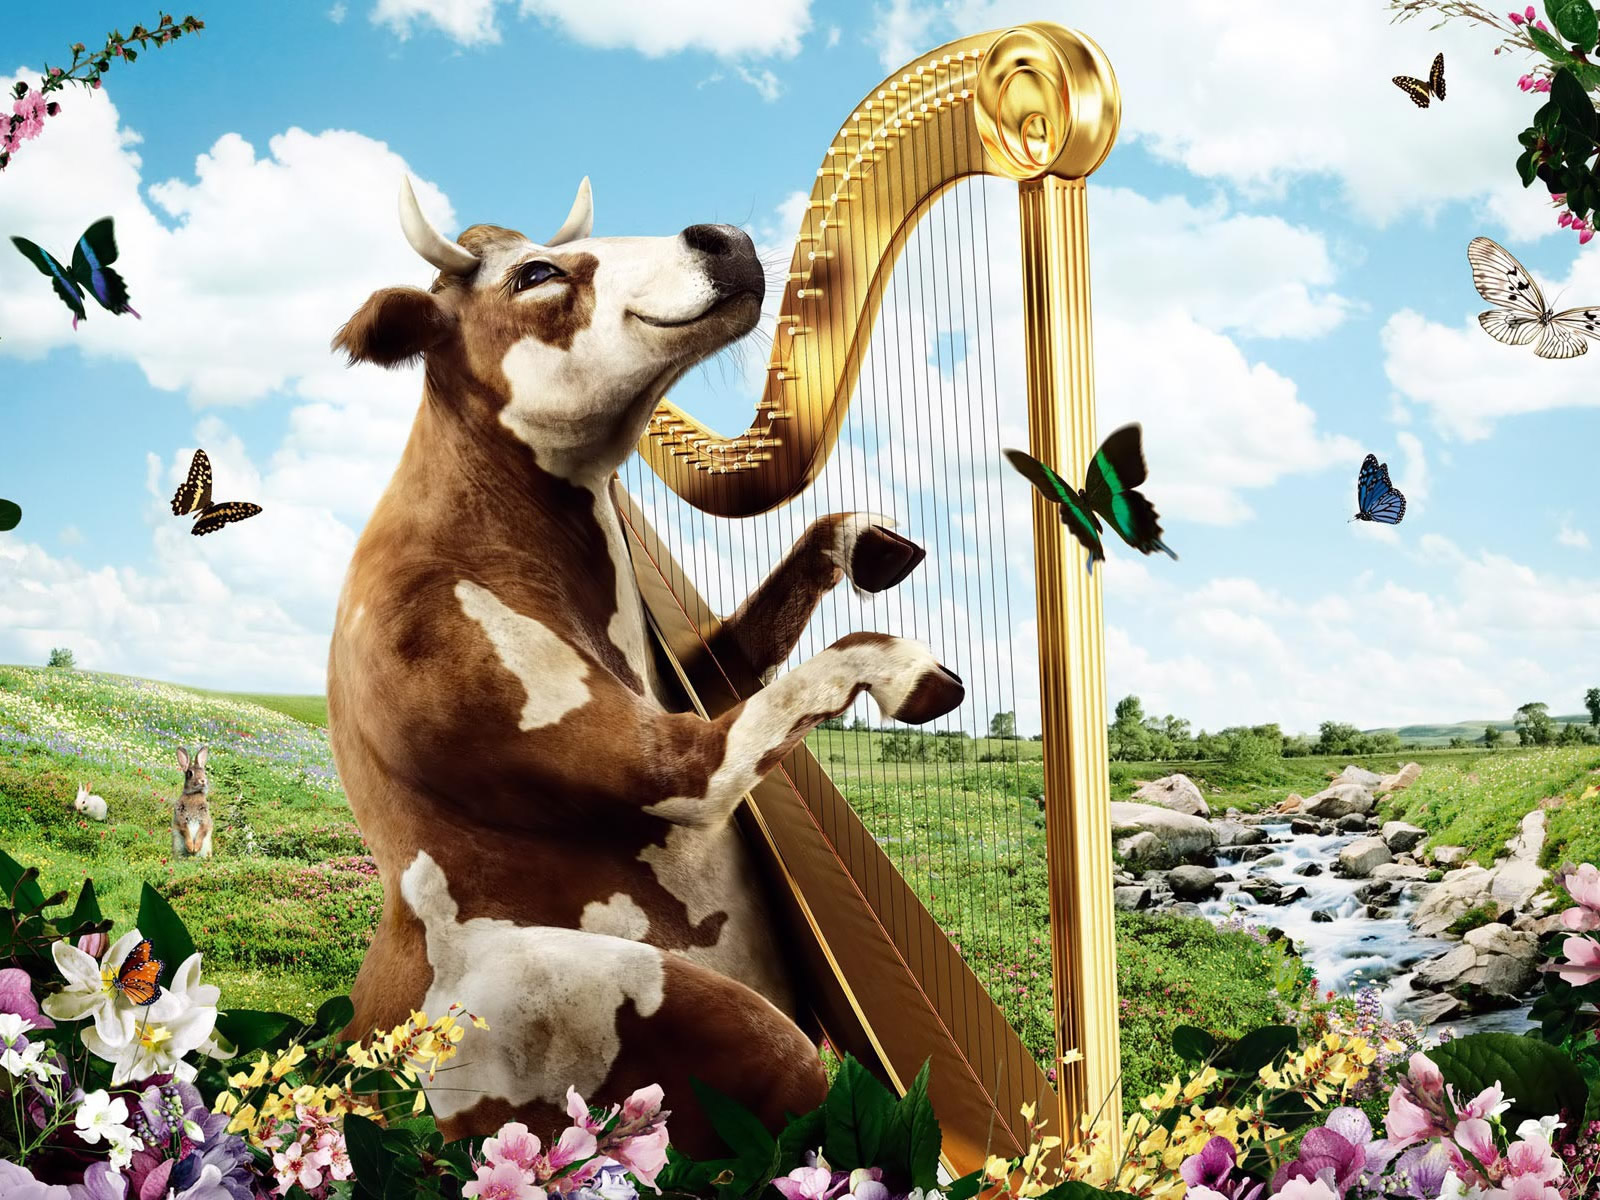 74+] Funny Cow Wallpaper on WallpaperSafari